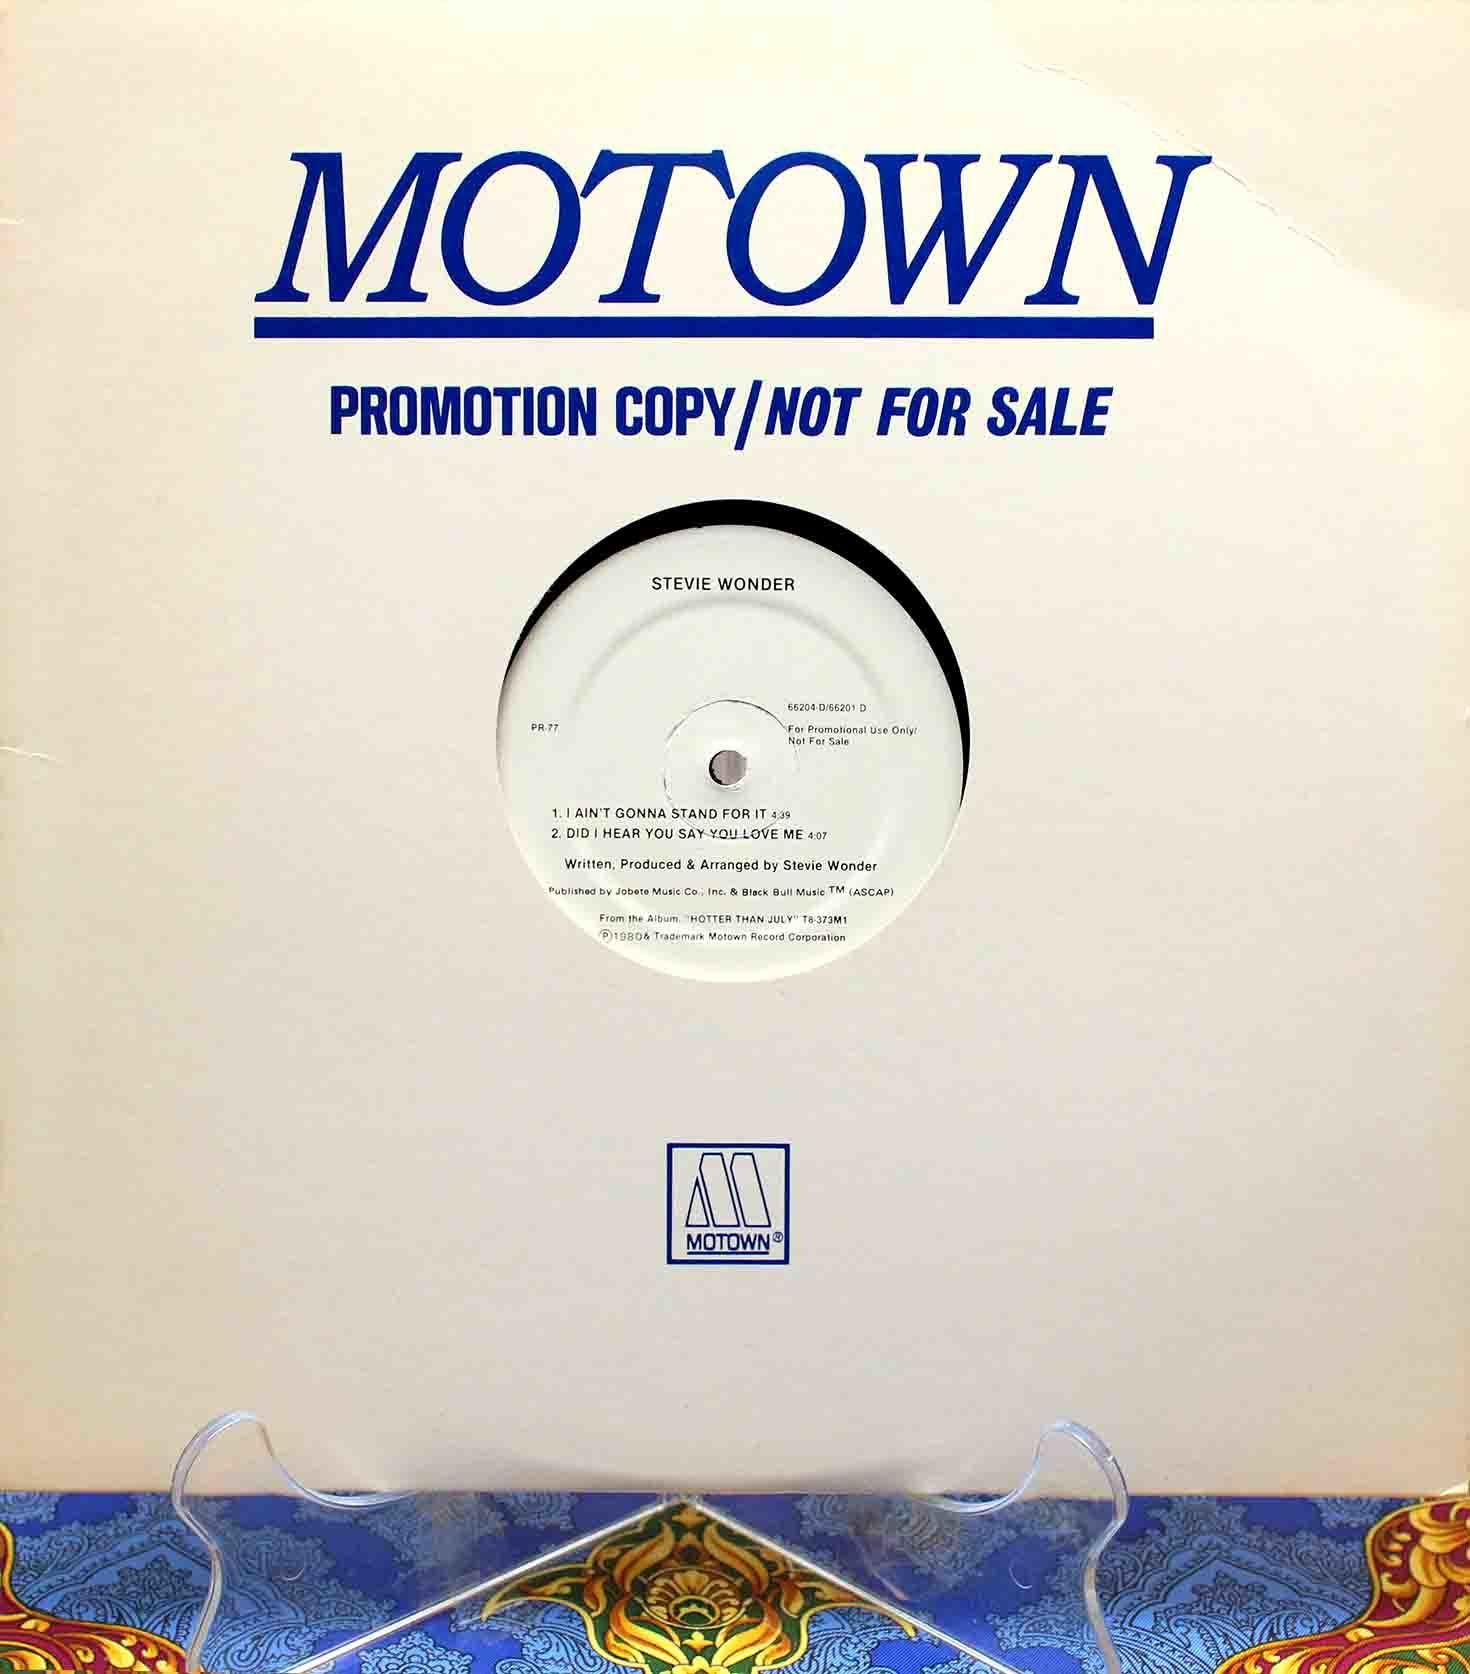 Stevie Wonder – Did I Hear You Say You Love Me 01